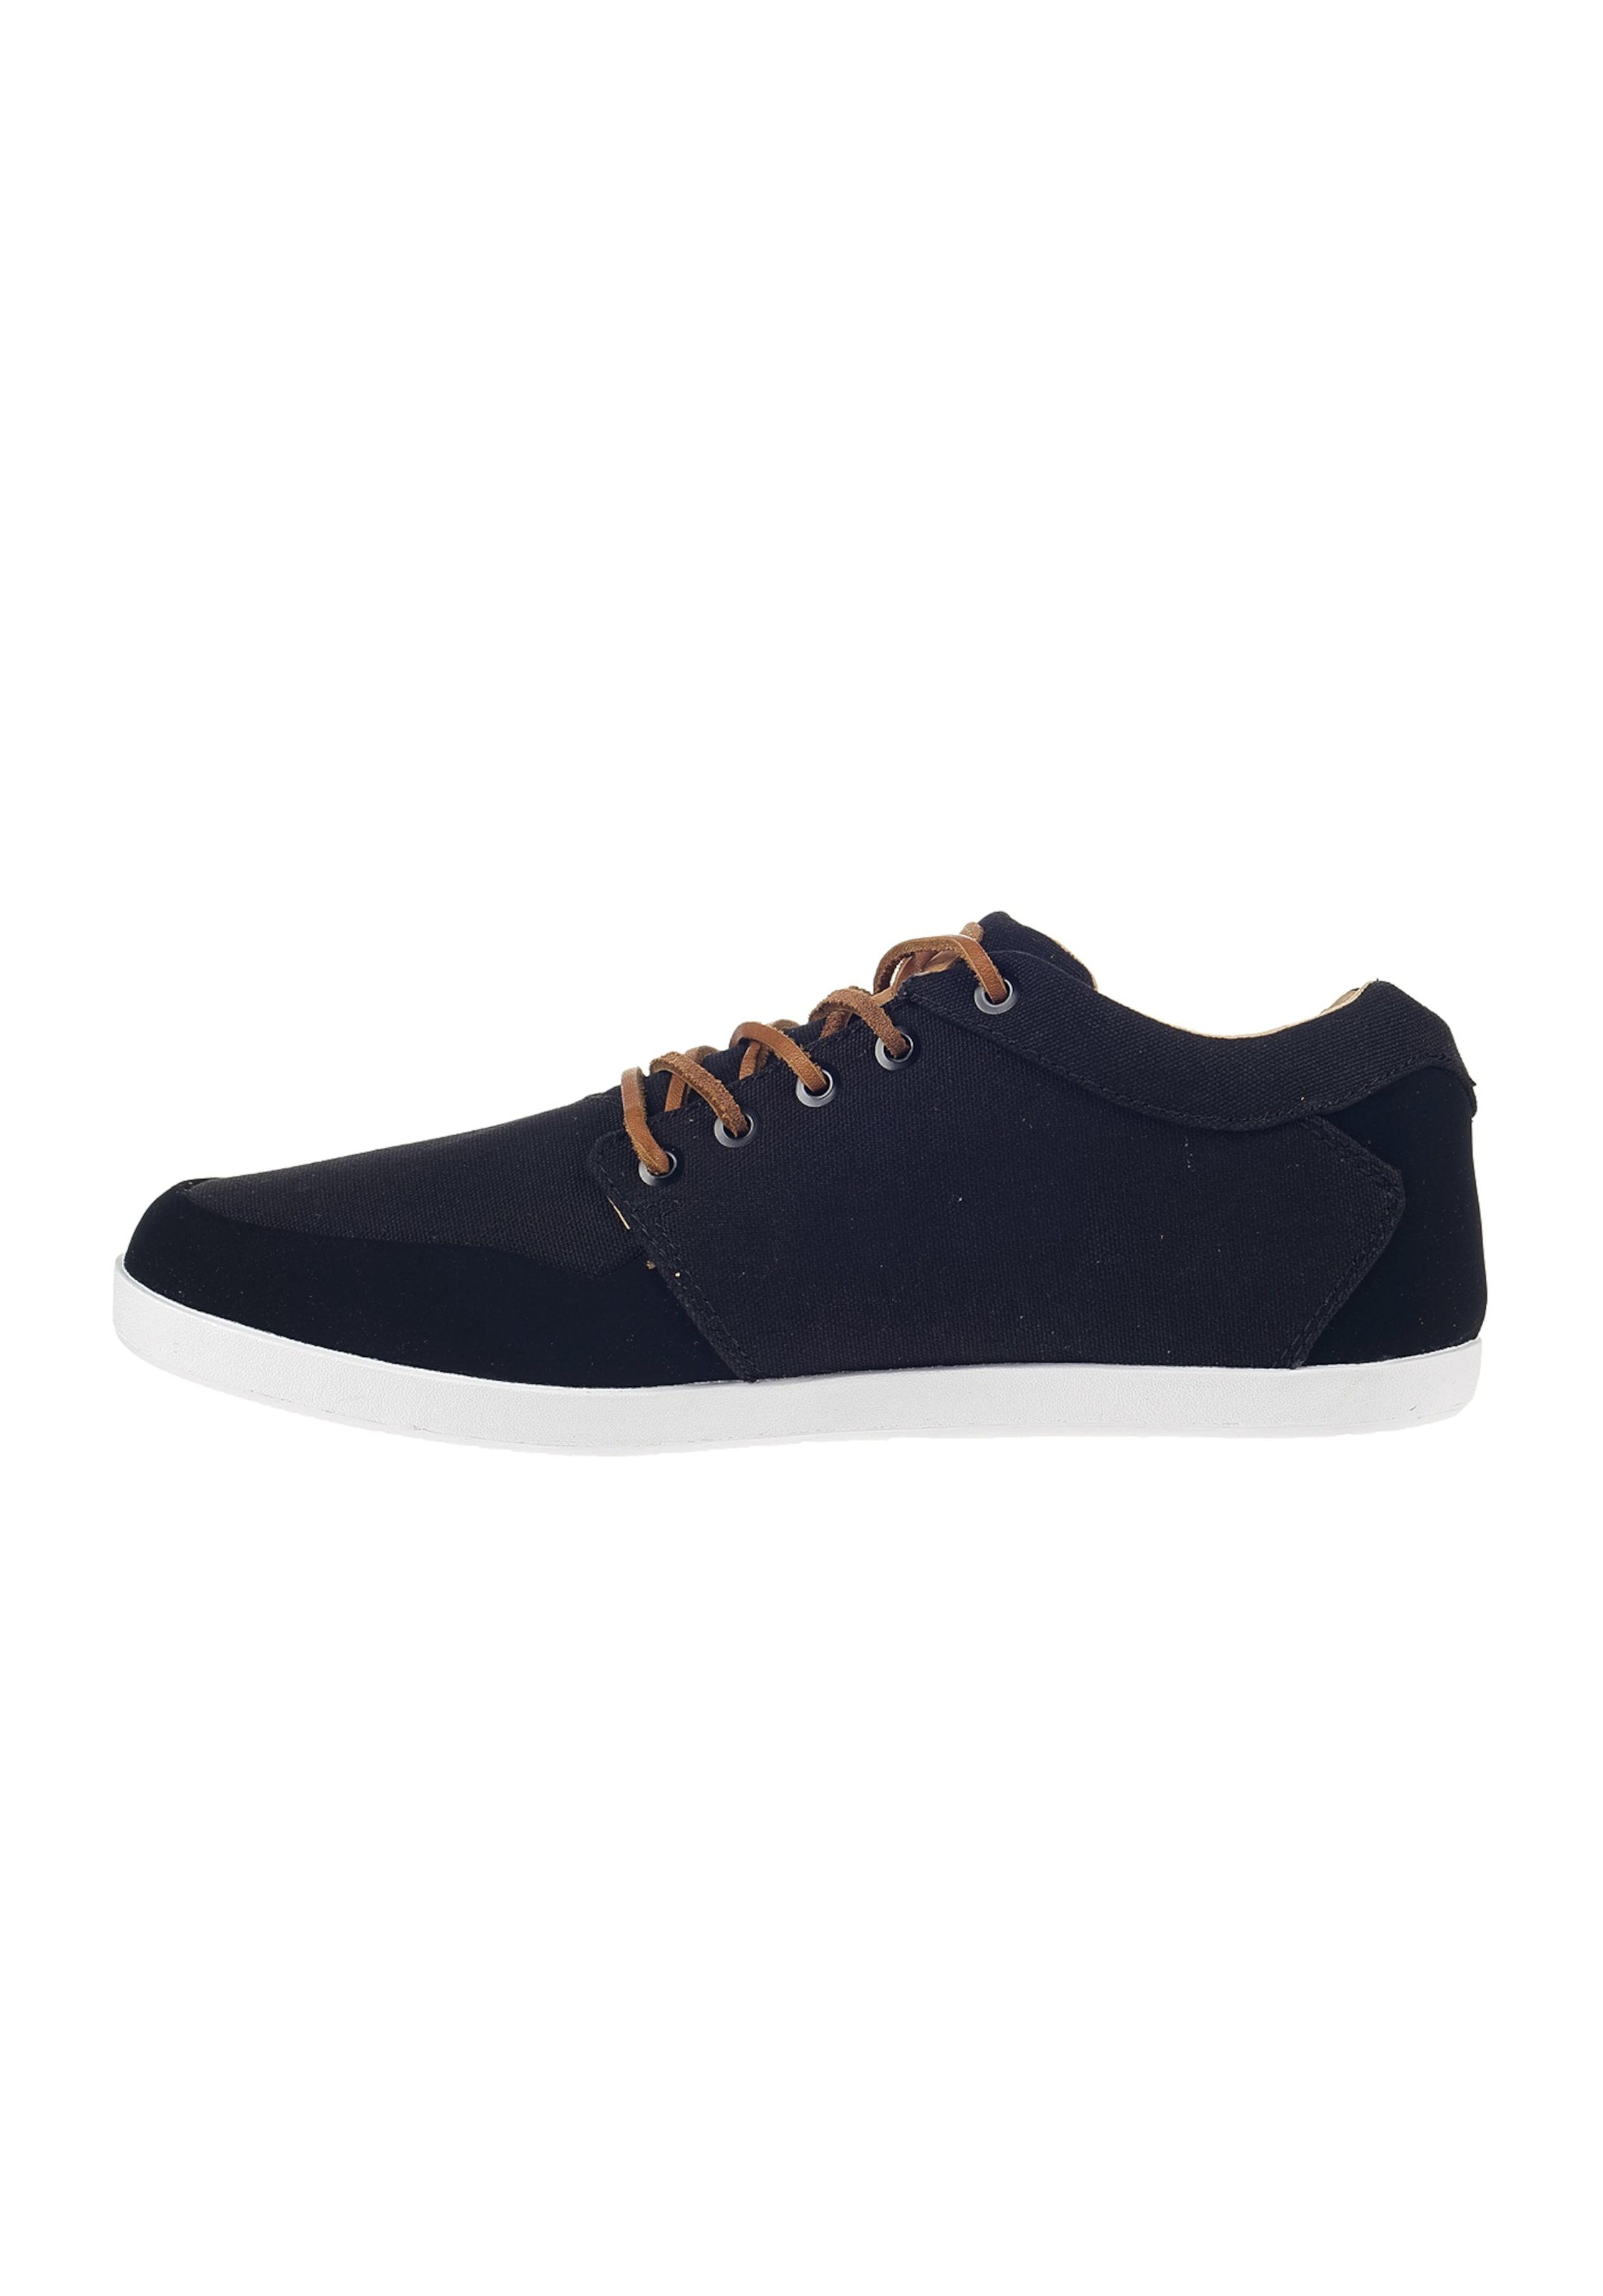 K1X Sneaker Günstige und langlebige Schuhe